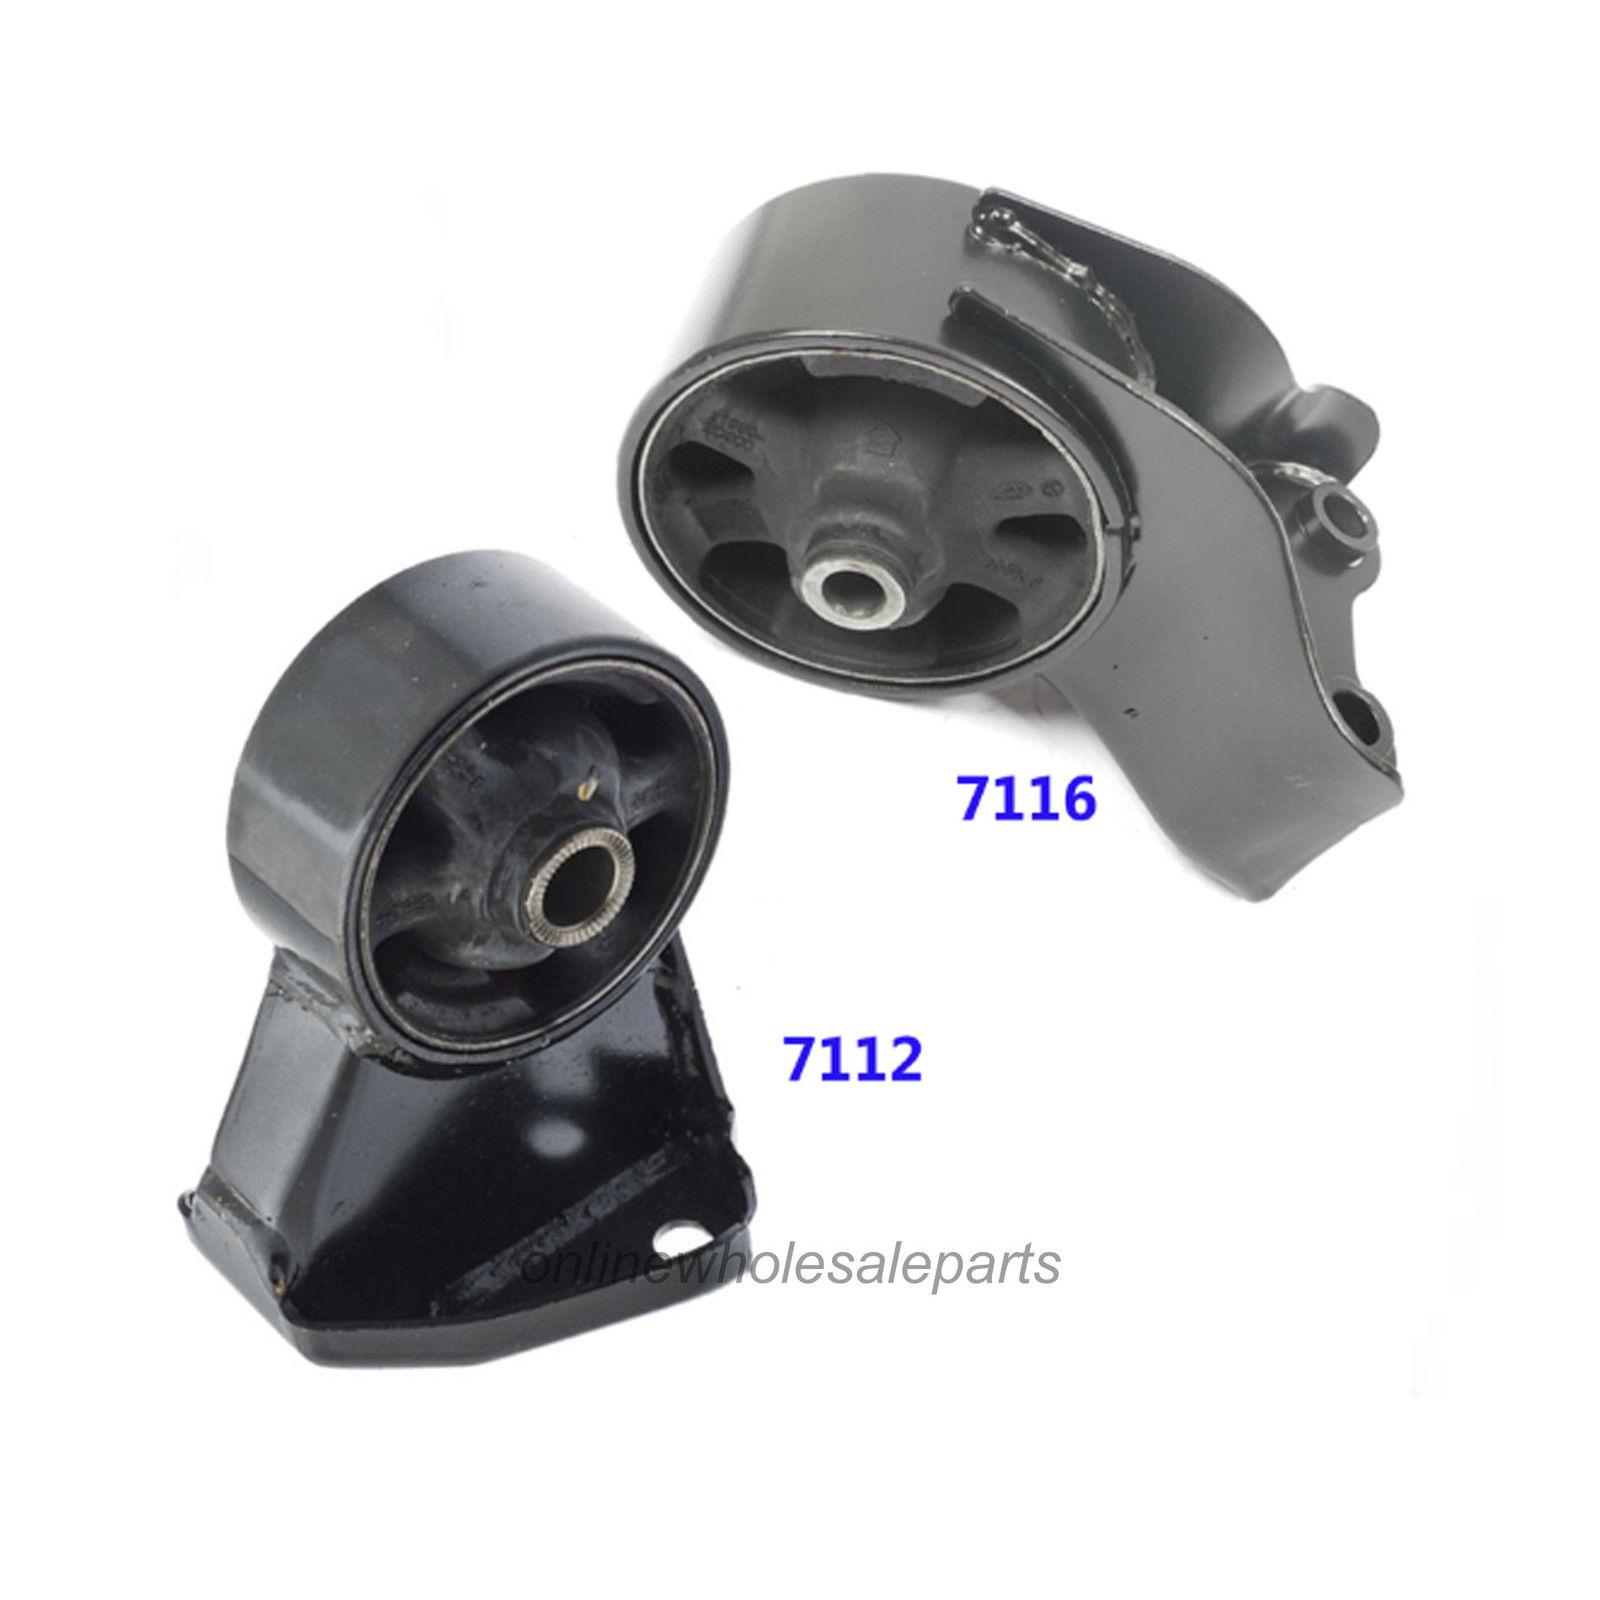 03-08 Hyundai Tiburon 2.7L Engine Motor Mount Set 2 PCS For Manual Trans. Fits